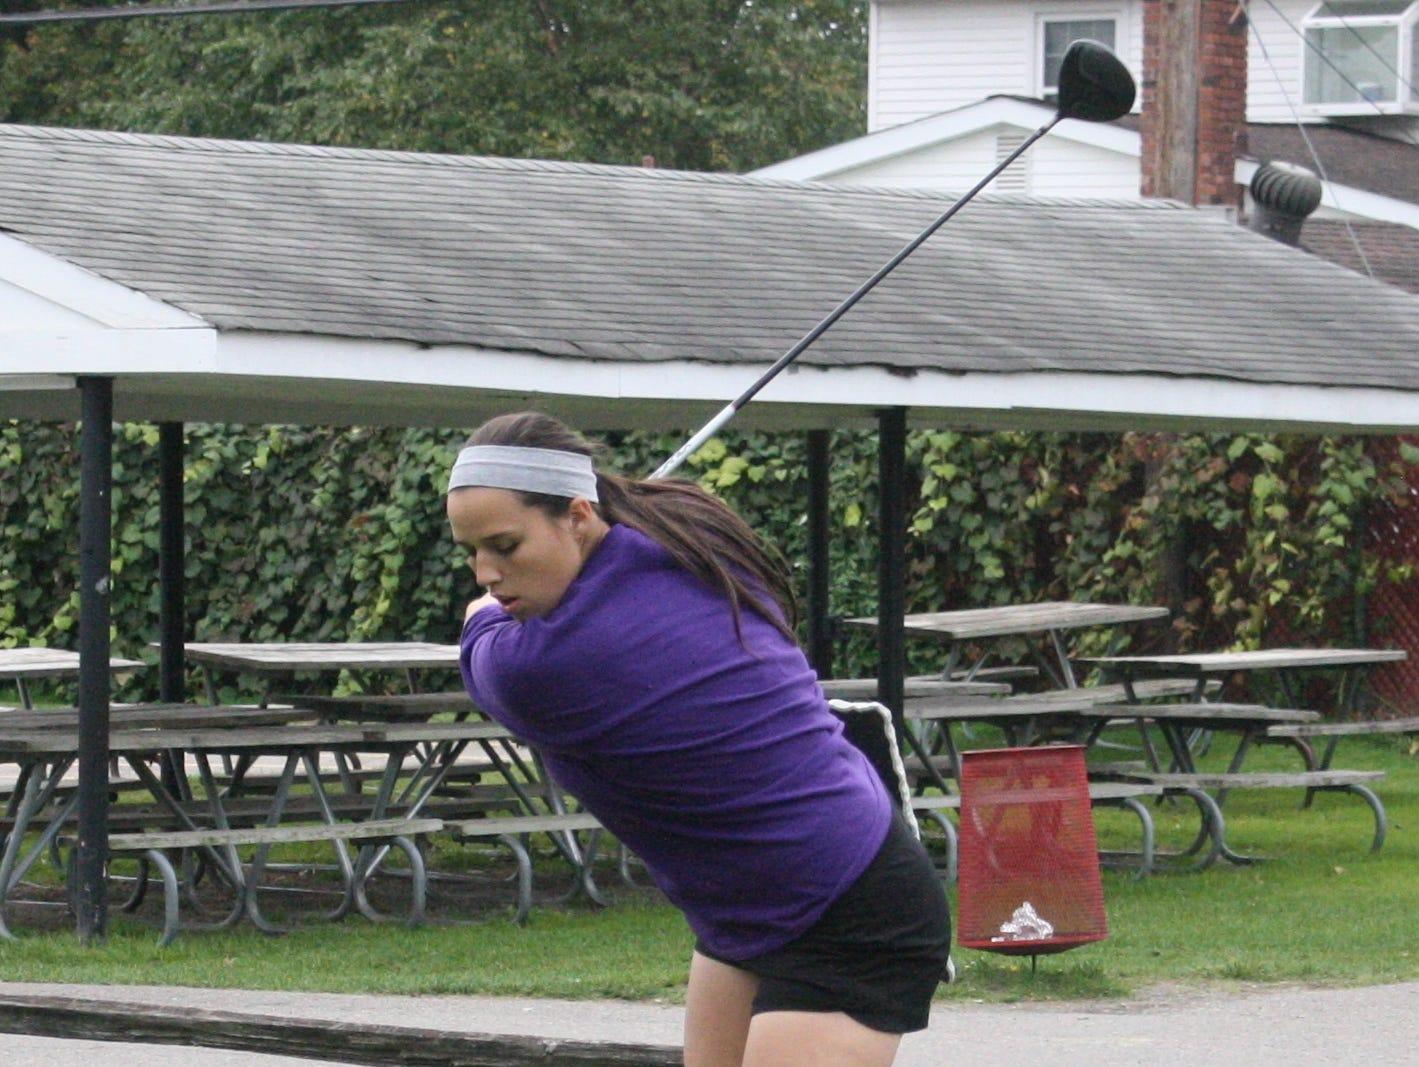 Kendall Payne has been Franklin's No. 1 golfer since her freshman season.